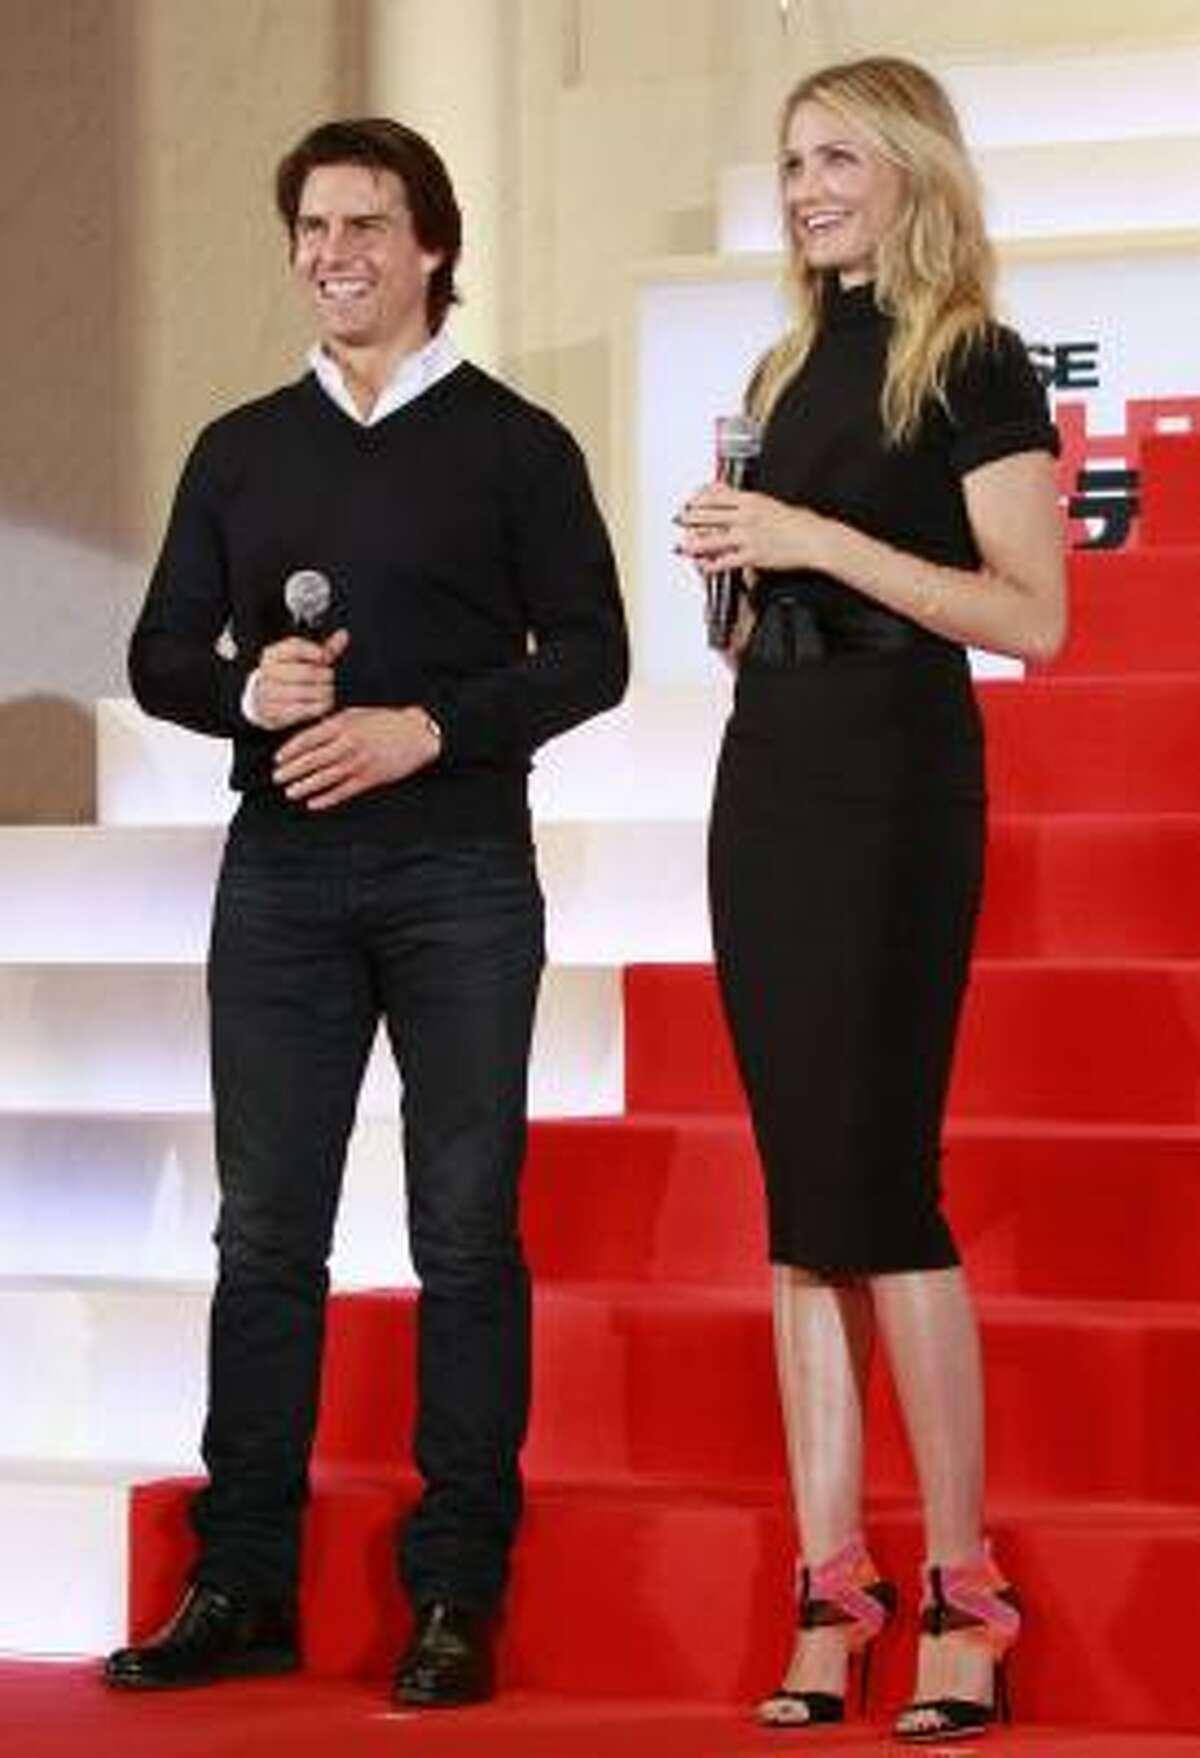 Tom CruiseHeight: 5' 7